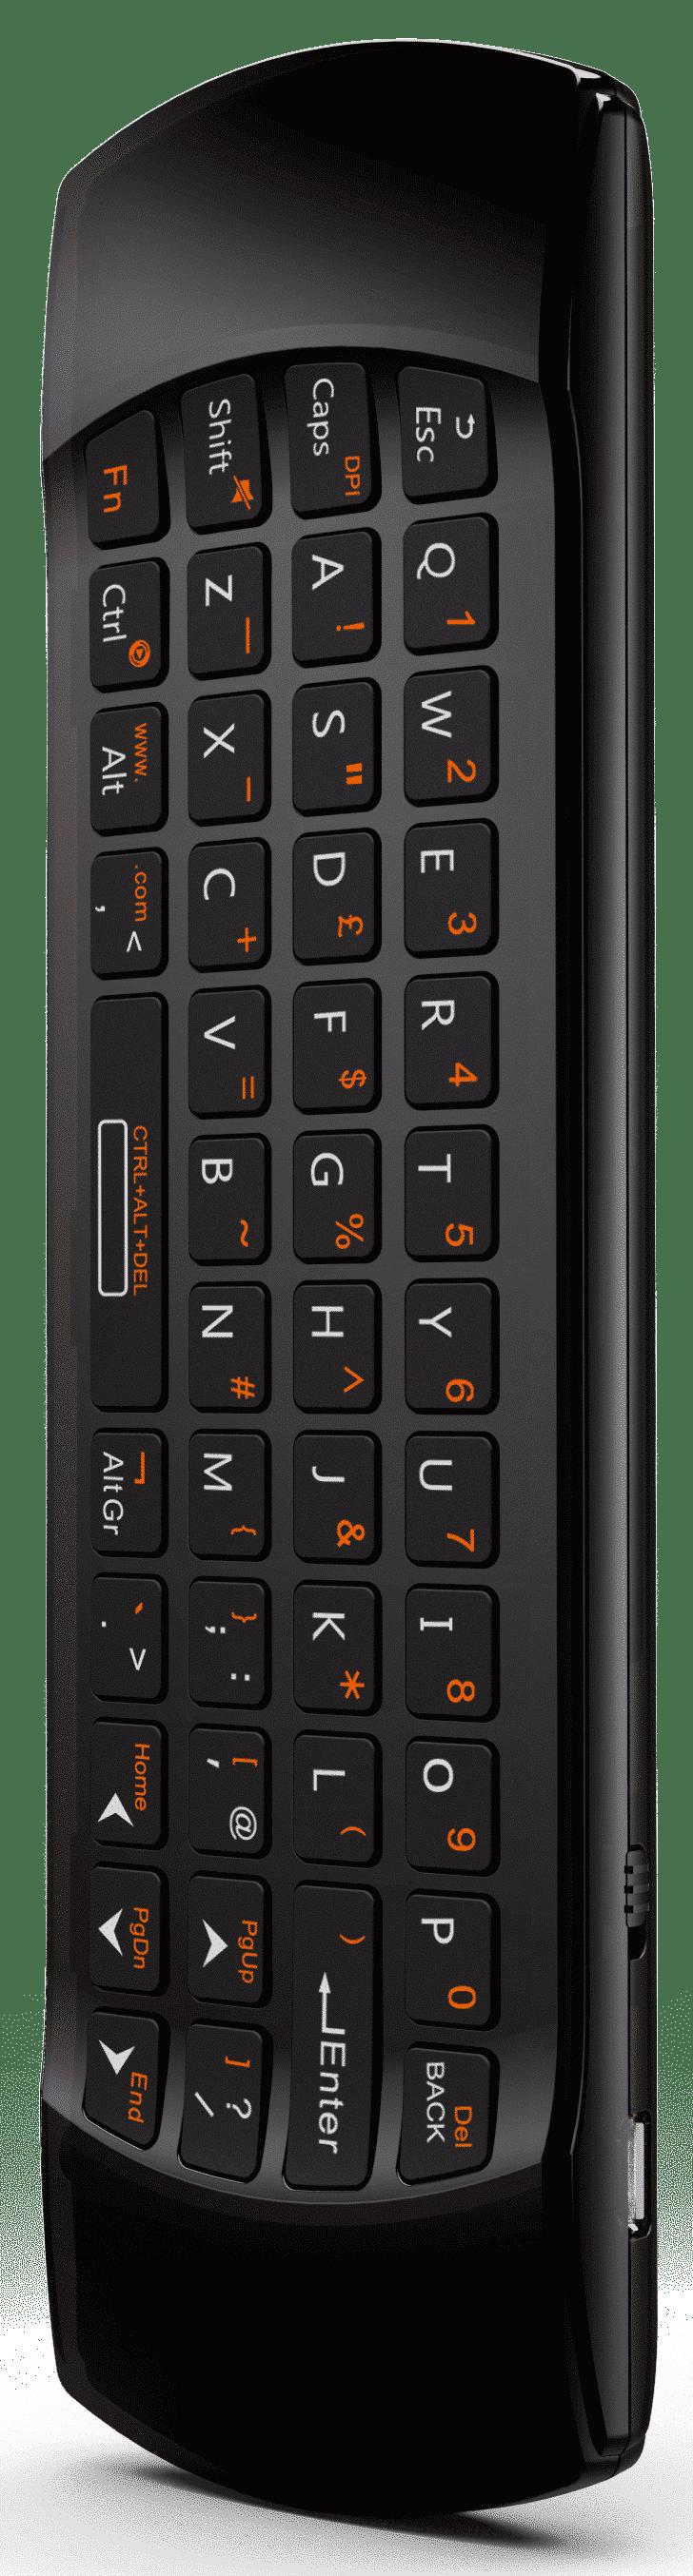 DroidBOX B52 Mini Keyboard Wireless Remote back QWERTY view